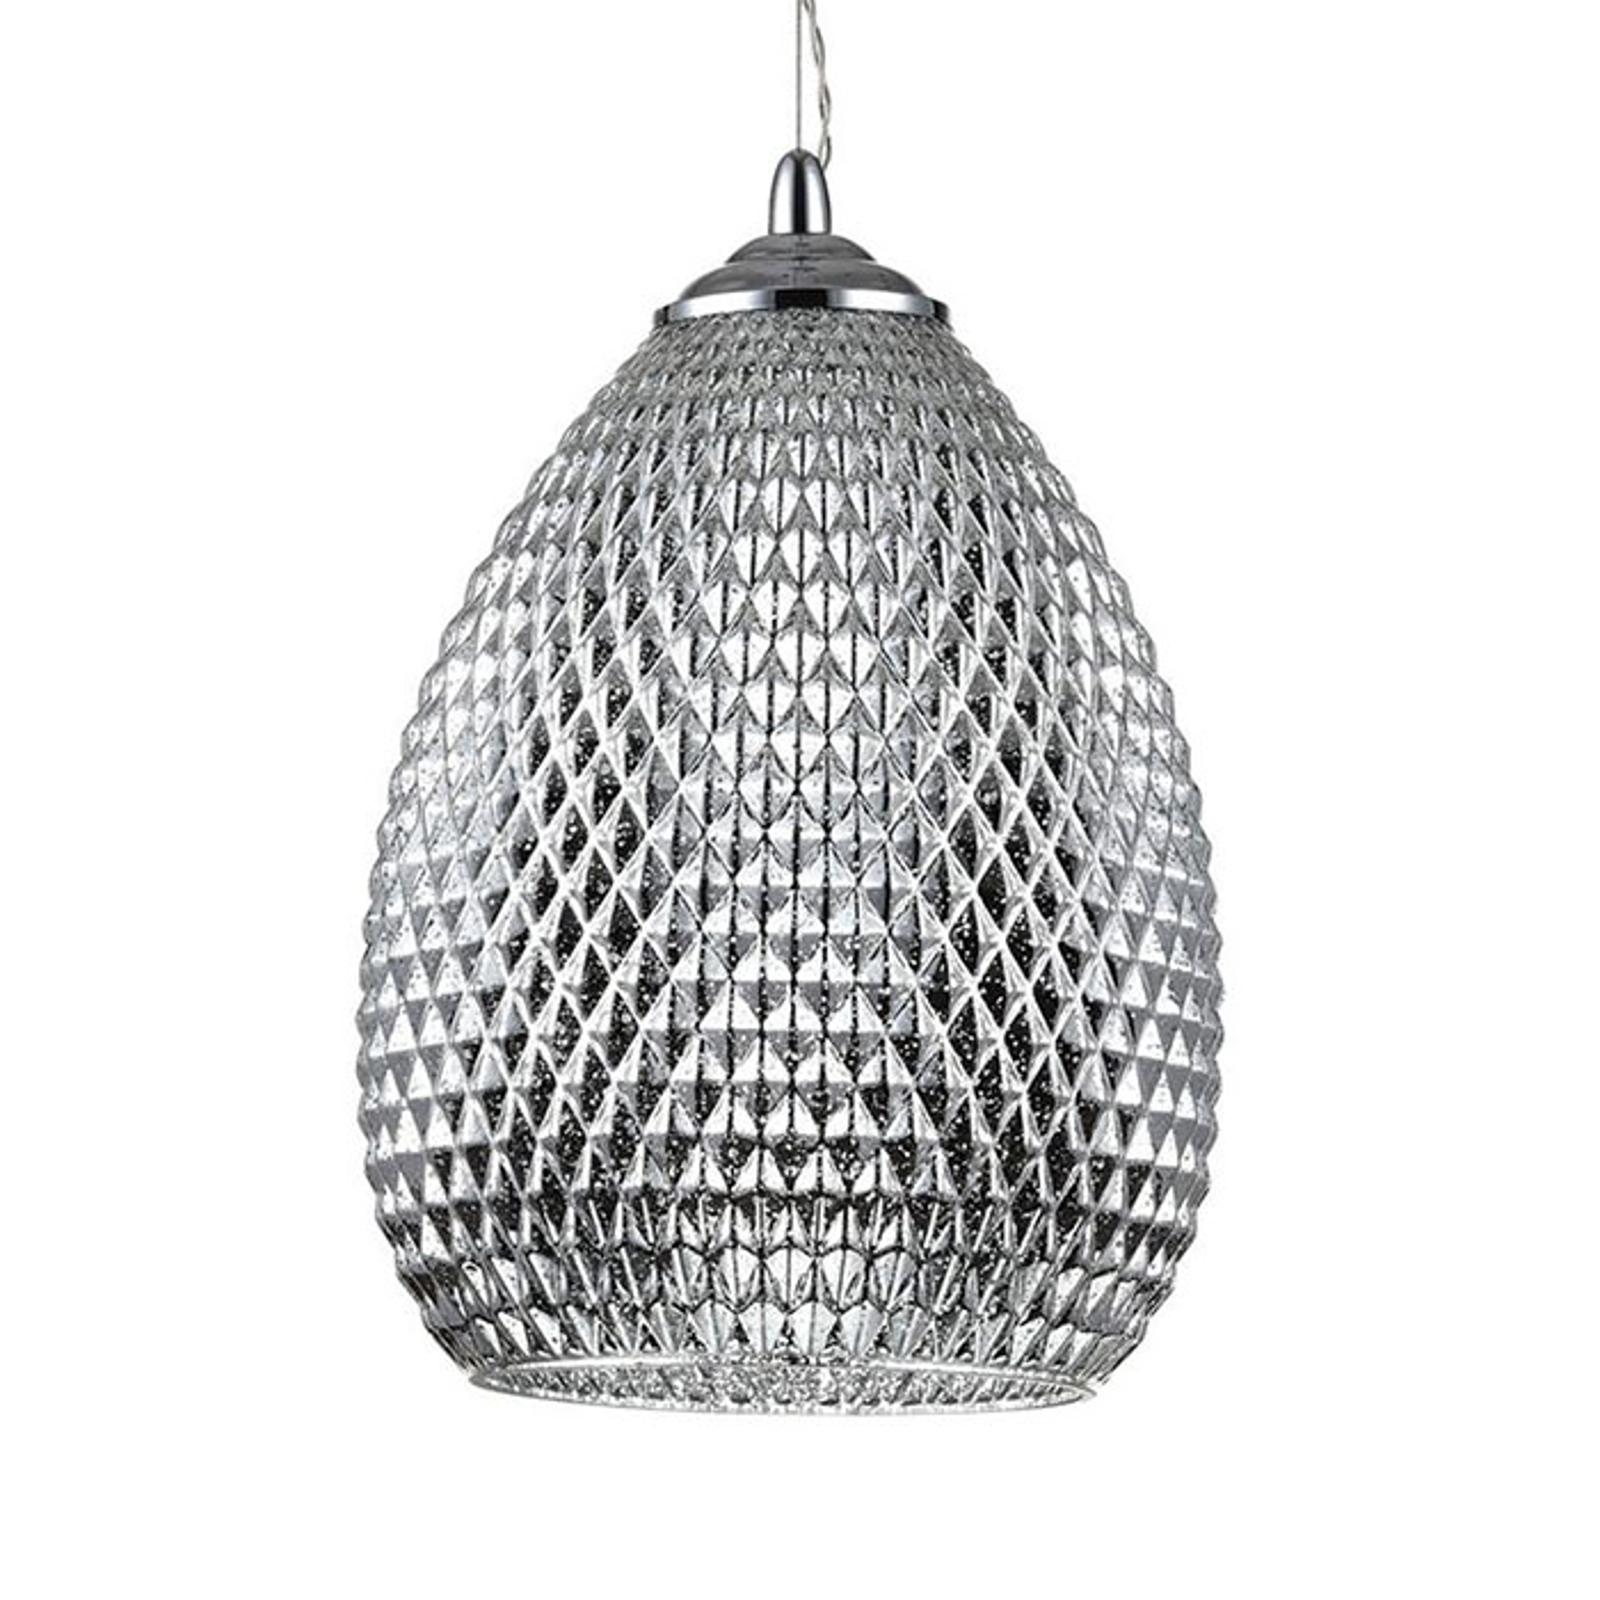 Lampa wisząca Moreno szklane ornamenty, Ø 22cm